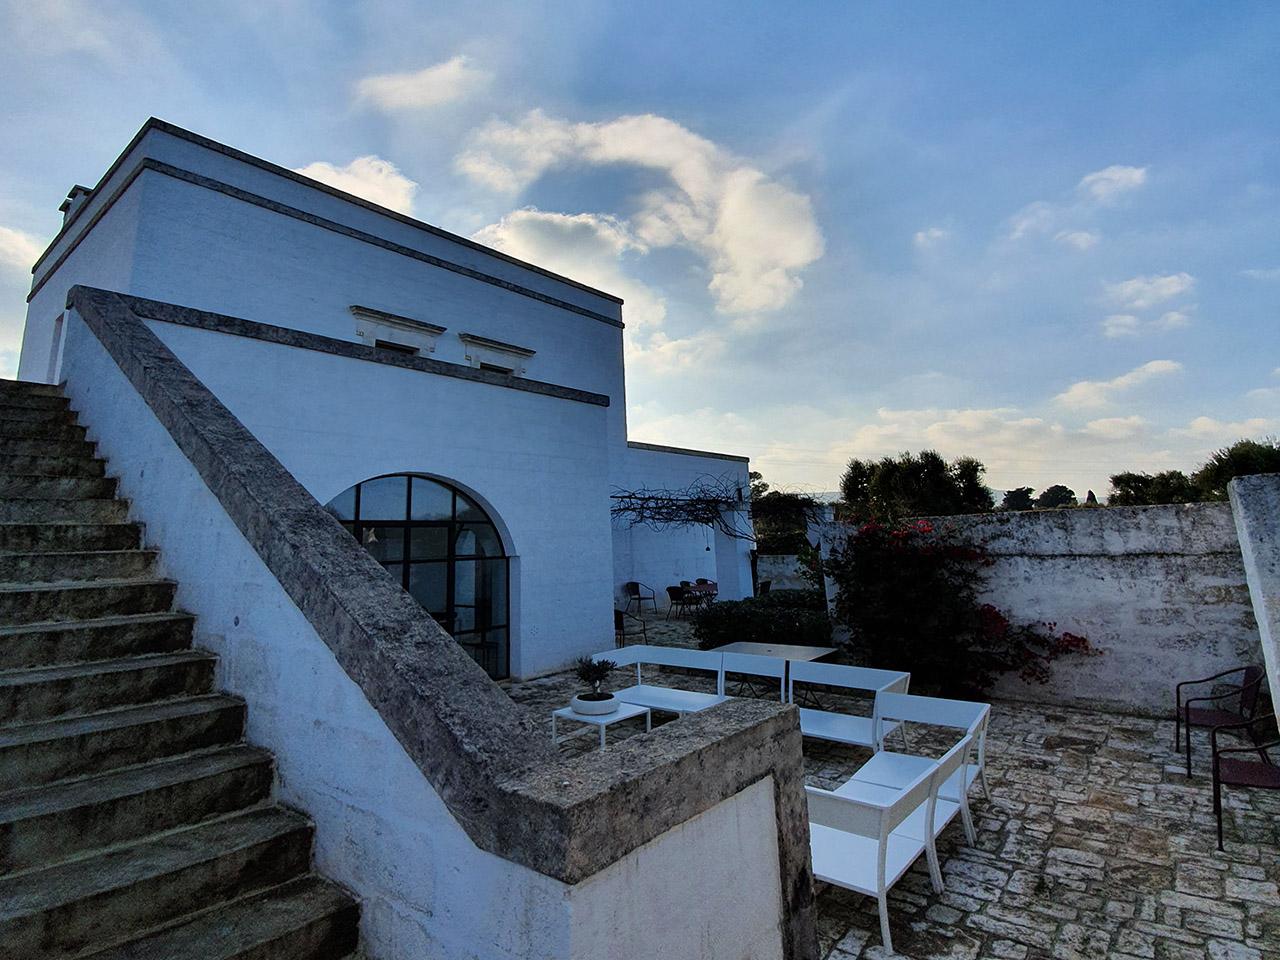 costruzioni restauri sirio ostuni restauro ristrutturazione masseria olive nardo ostuni 20200103 142613